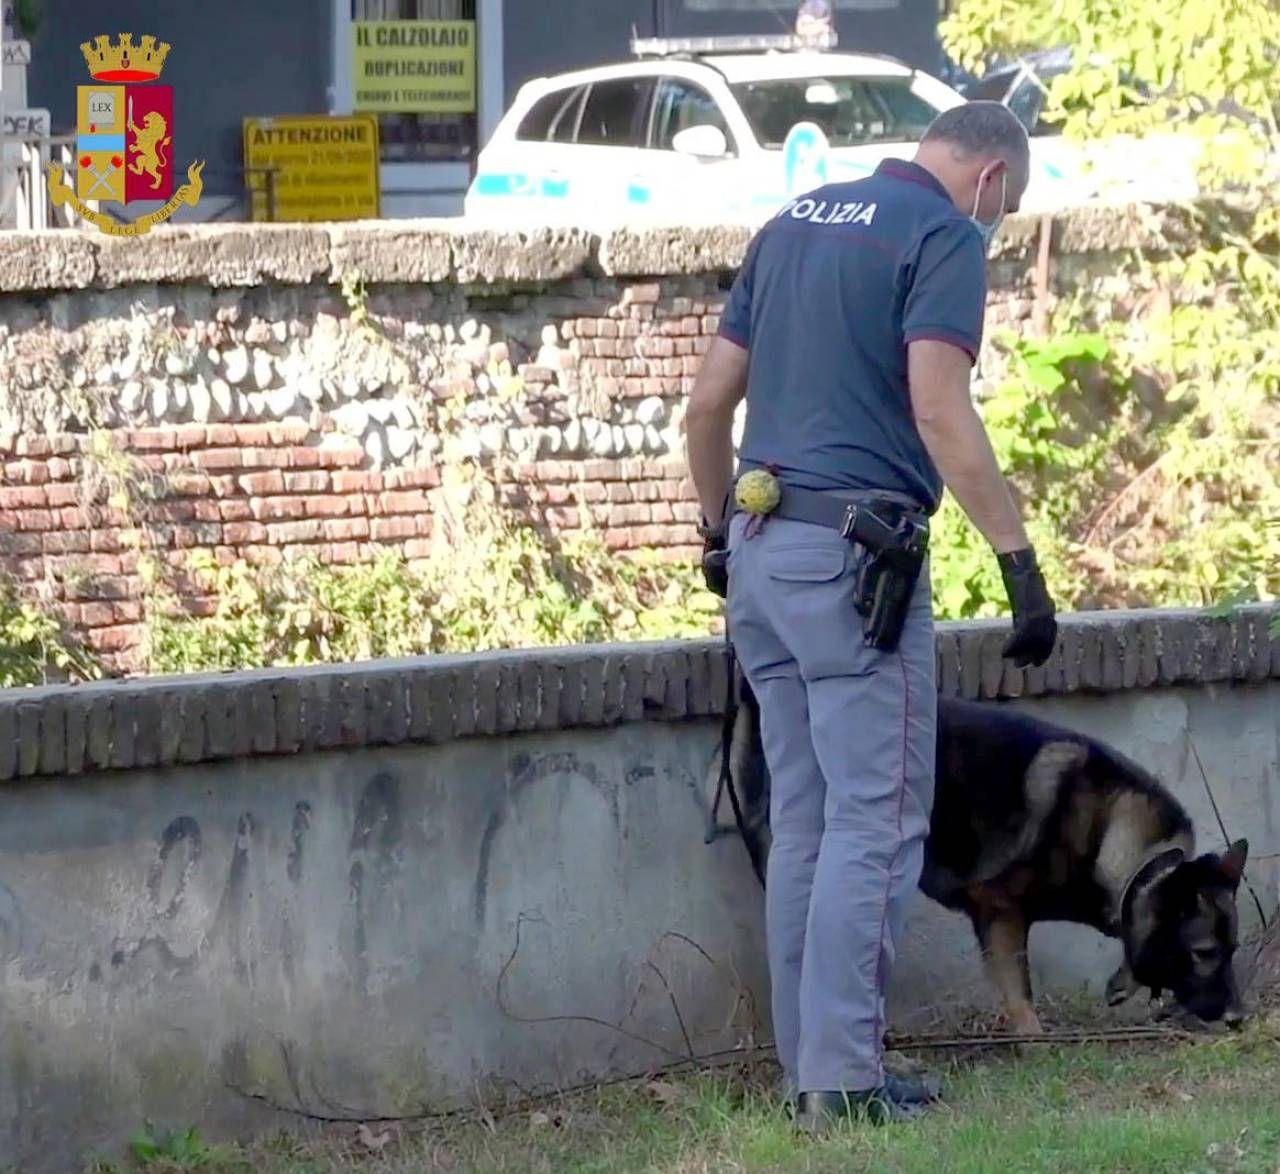 L'operazione portata avanti dai poliziotti arrivati da 15 città dopo 7 mesi di indagini